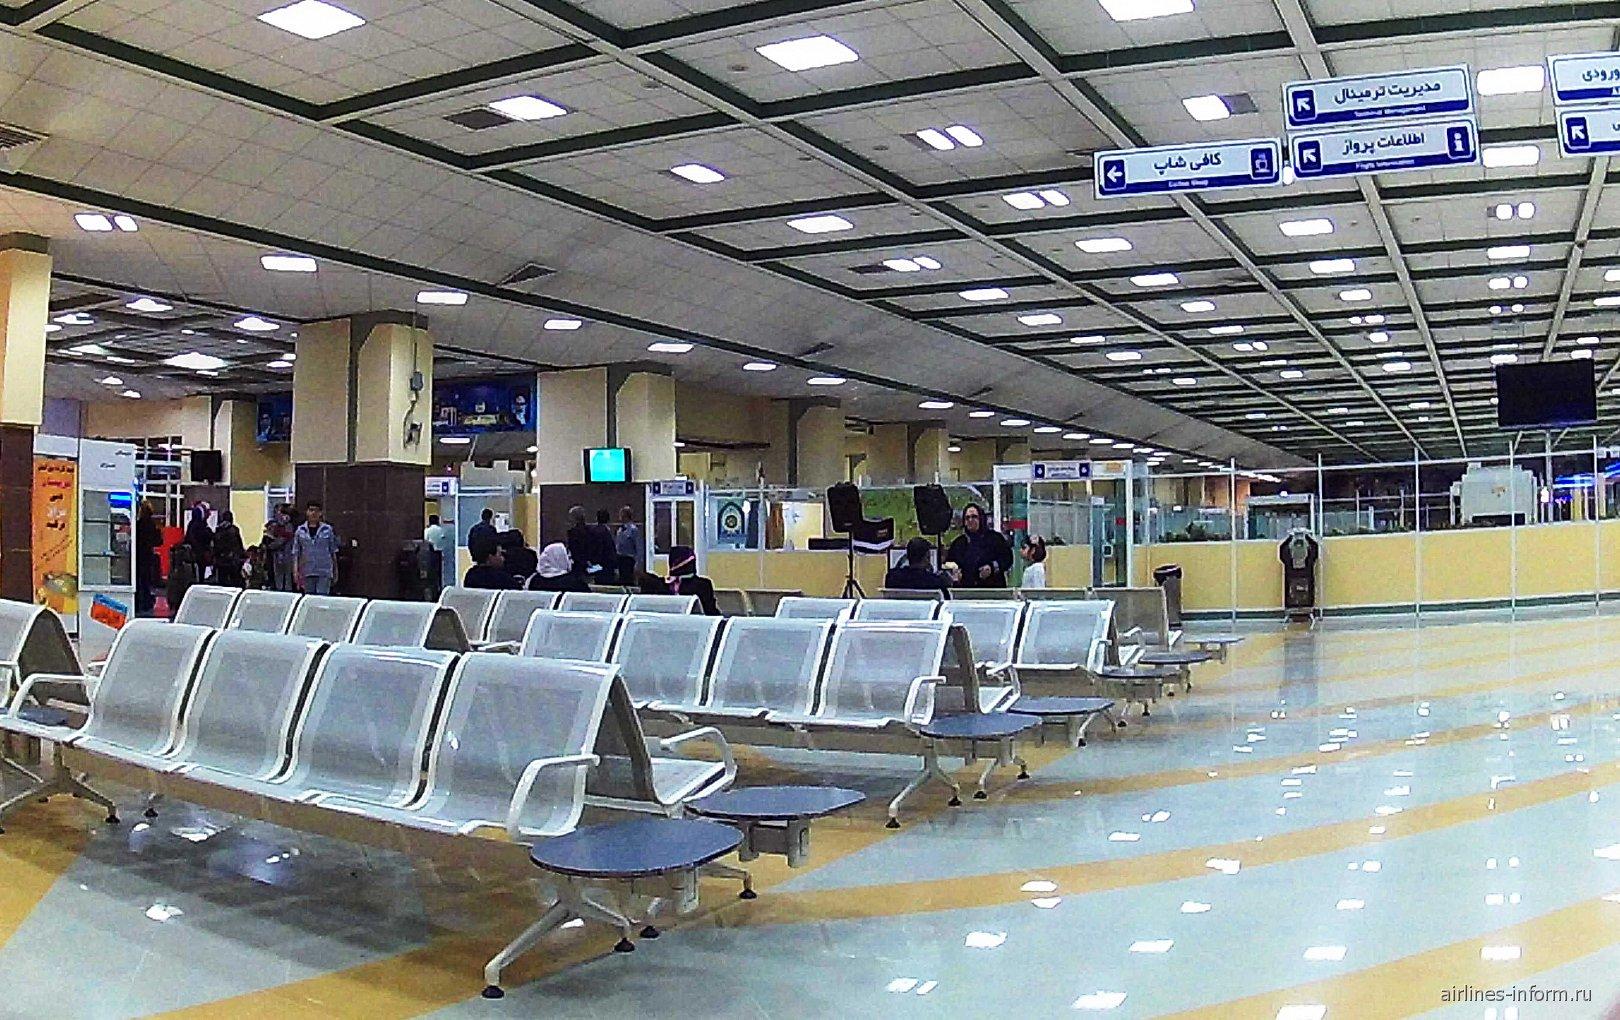 Зал ожидания в аэропорту Шираз